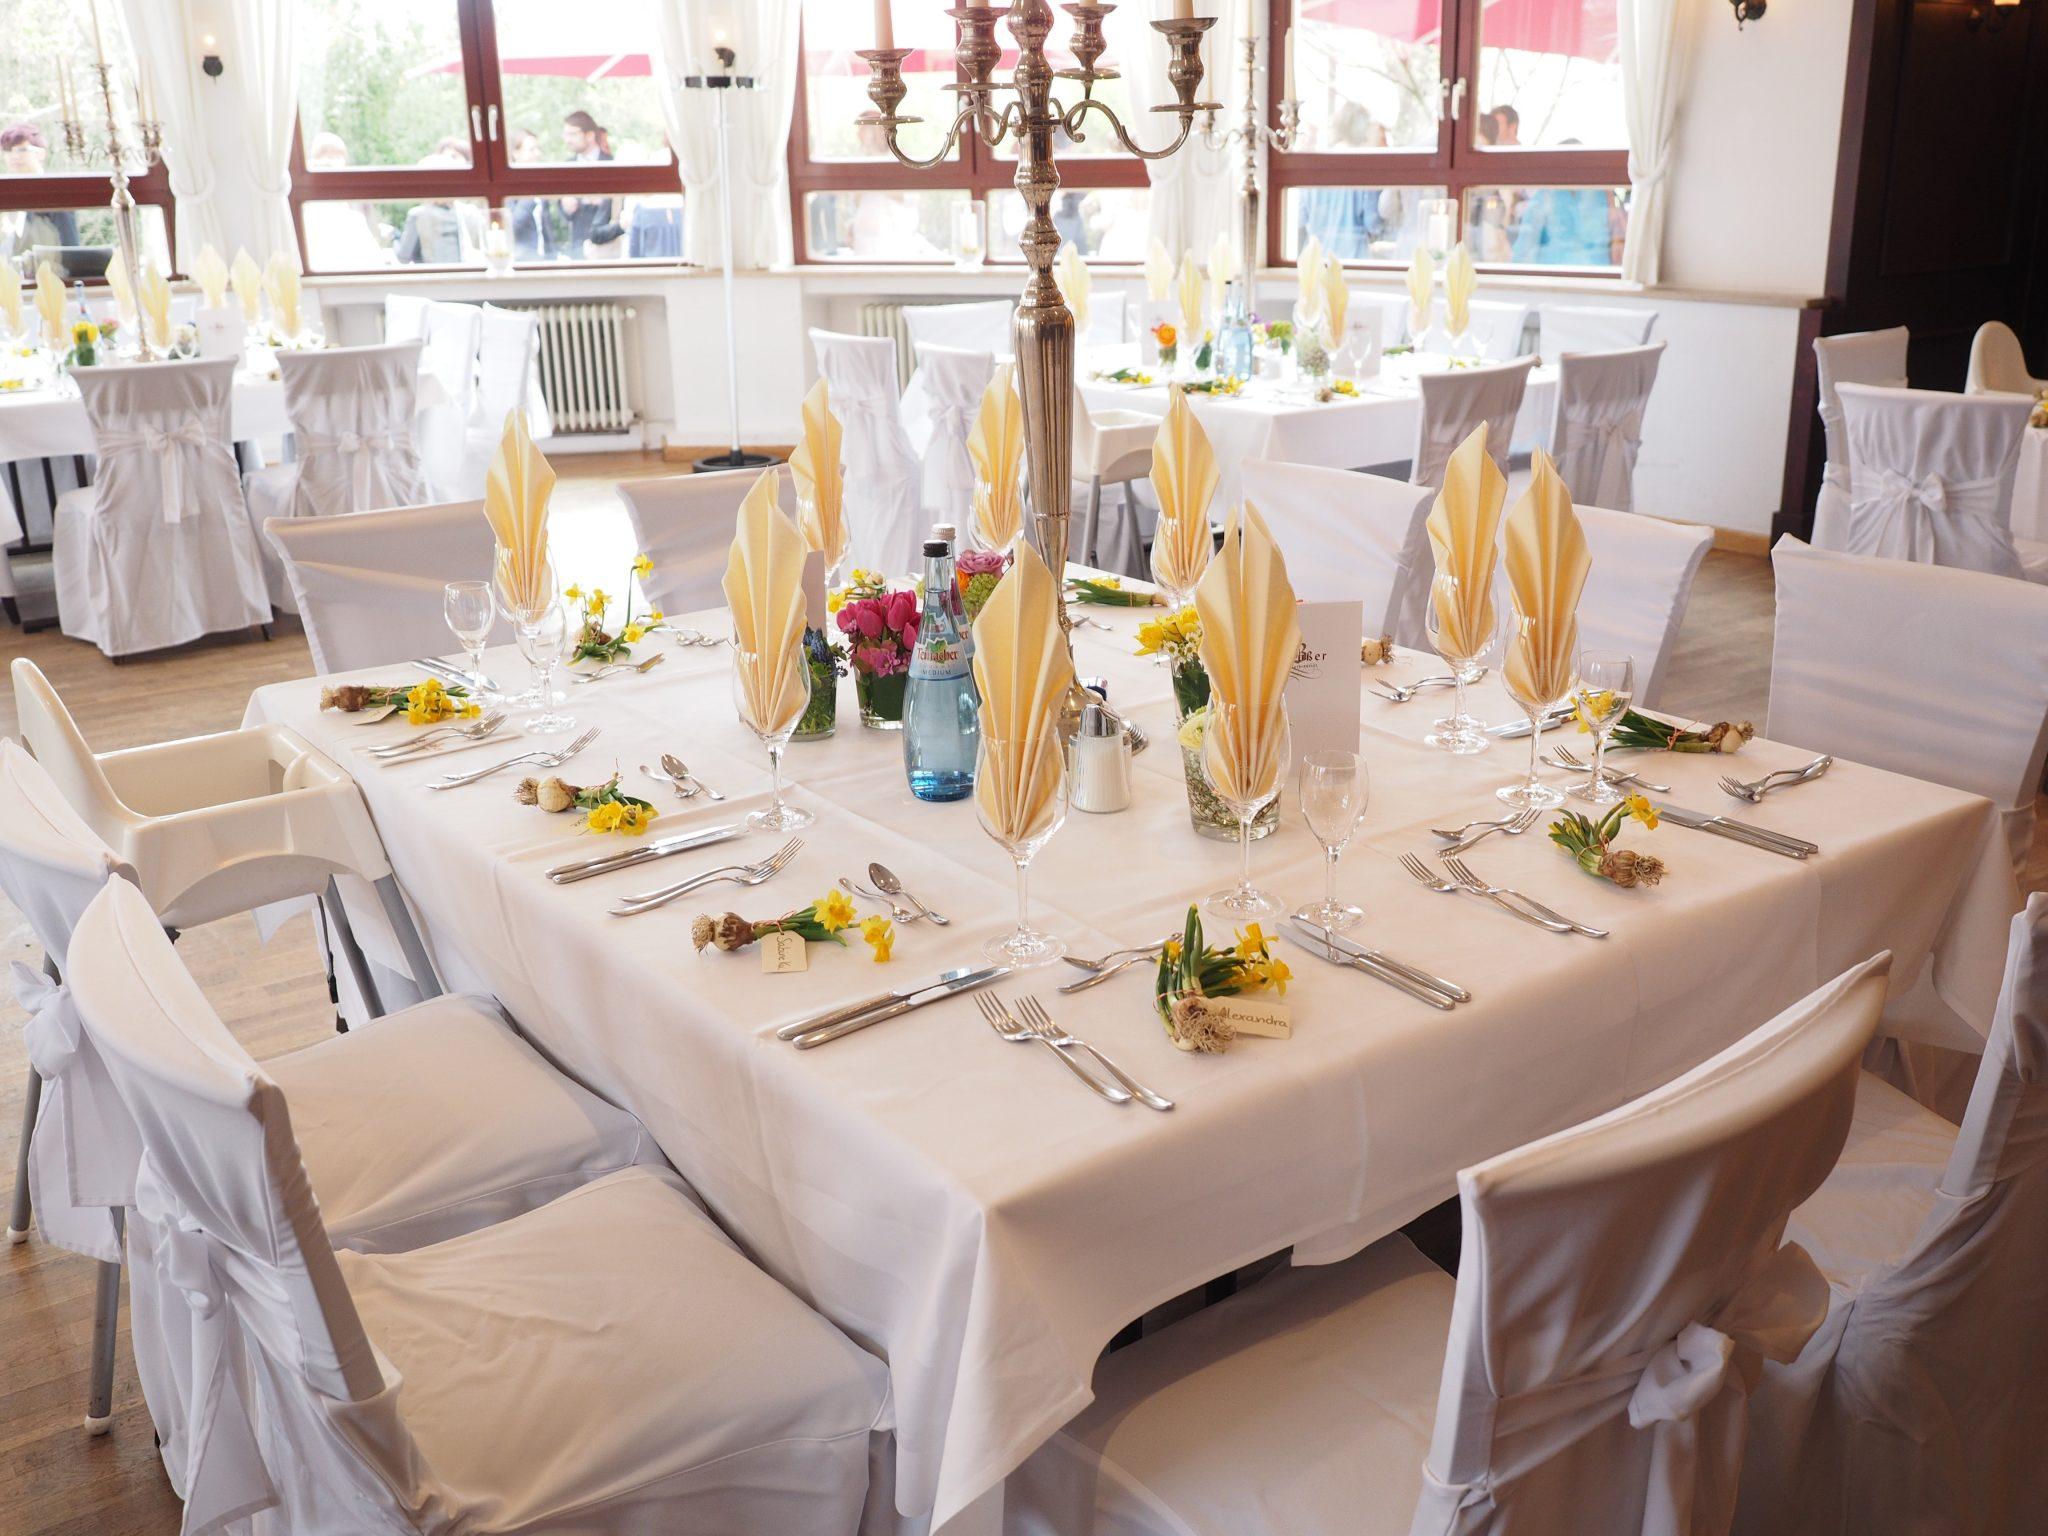 Restaurant Dining Design Inspiration